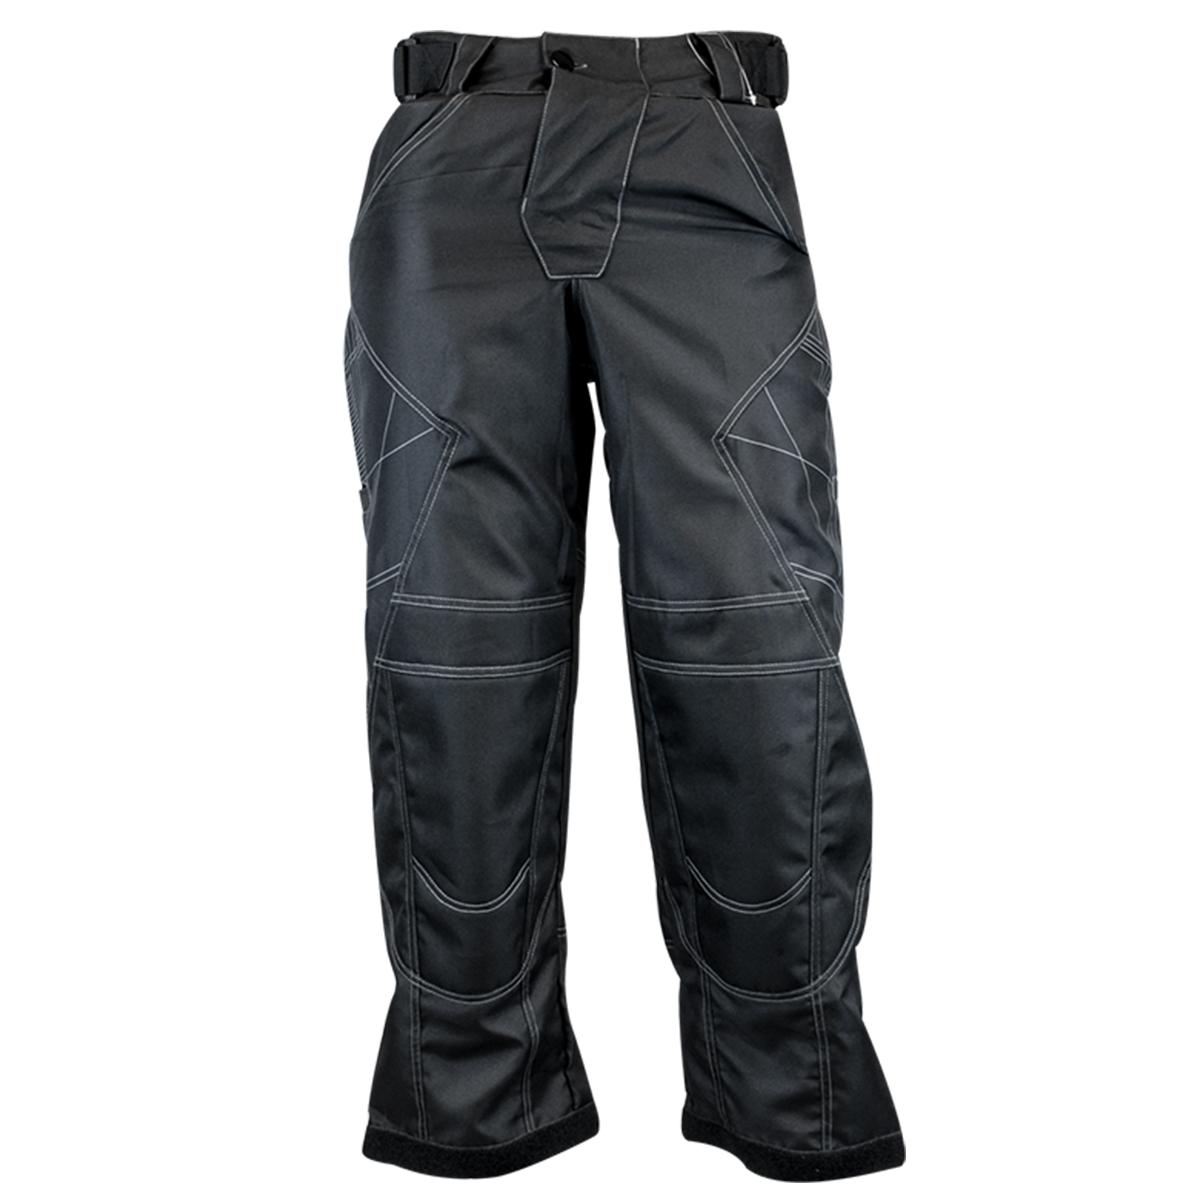 Valken Fate Exo Paintball Pants - Black - Medium